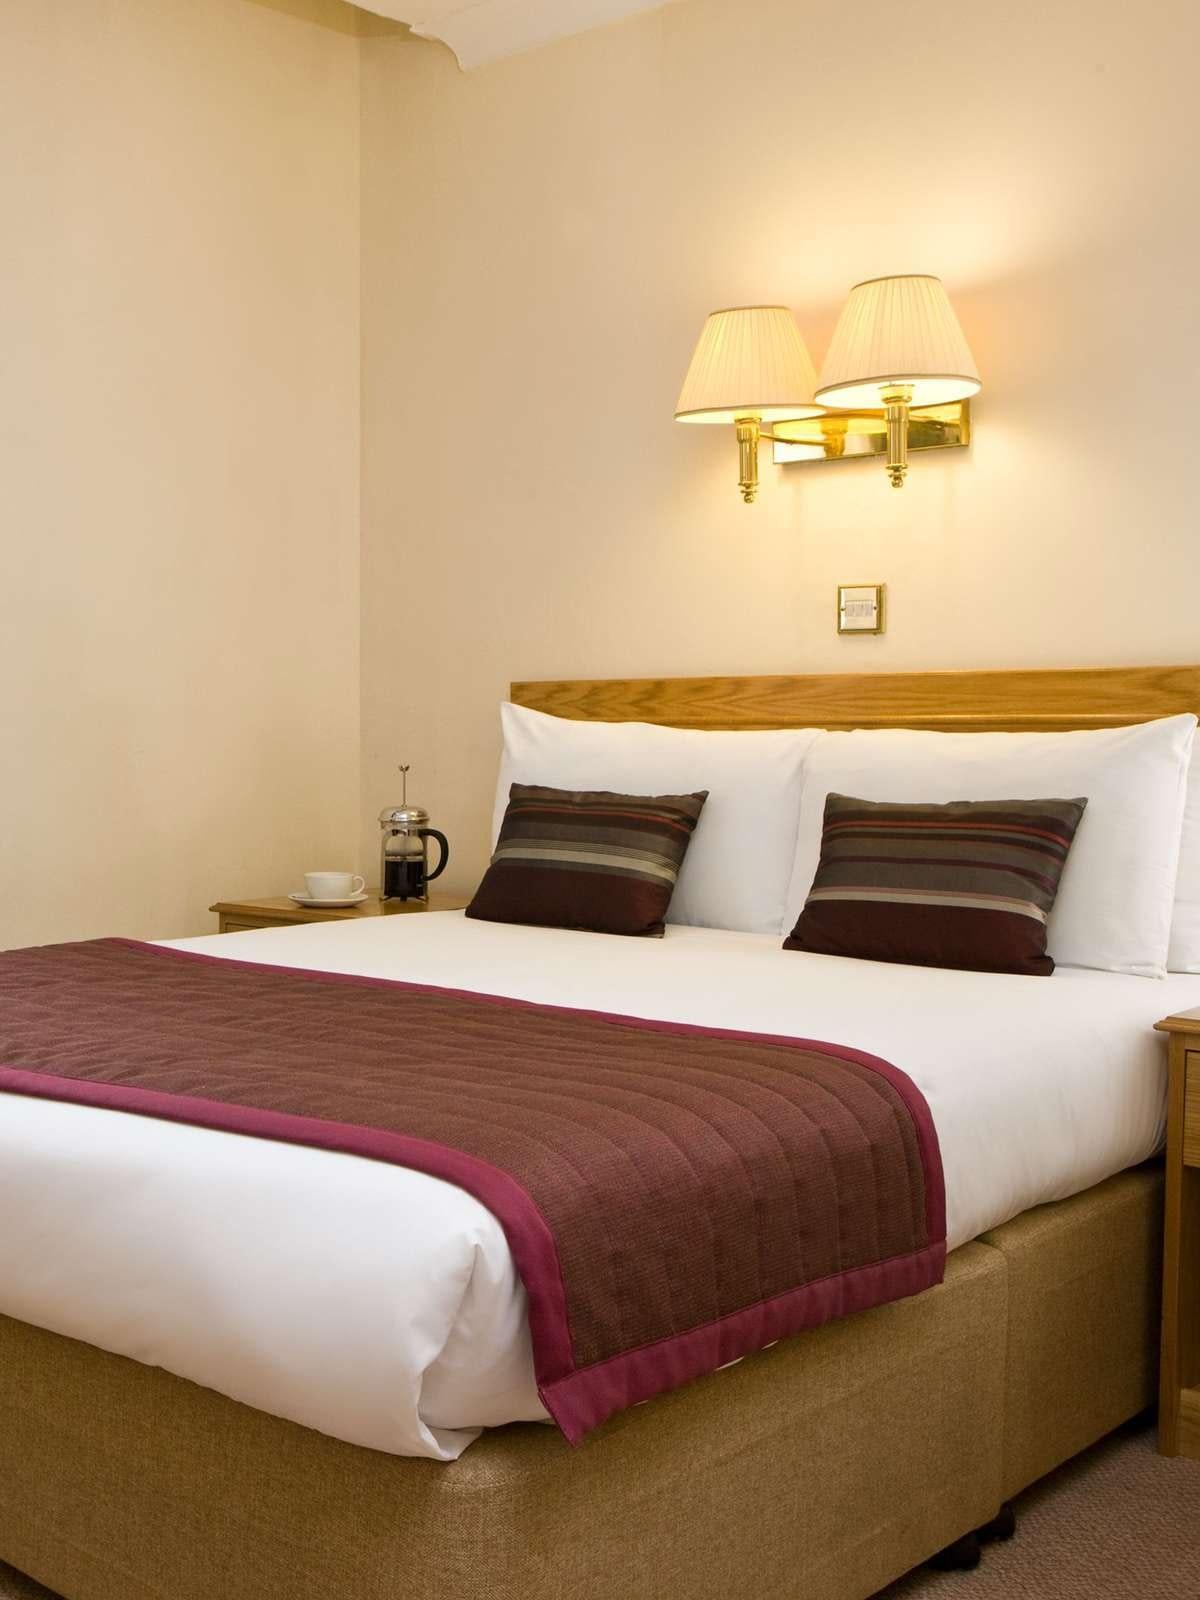 Best Western Burns Hotel Kensington